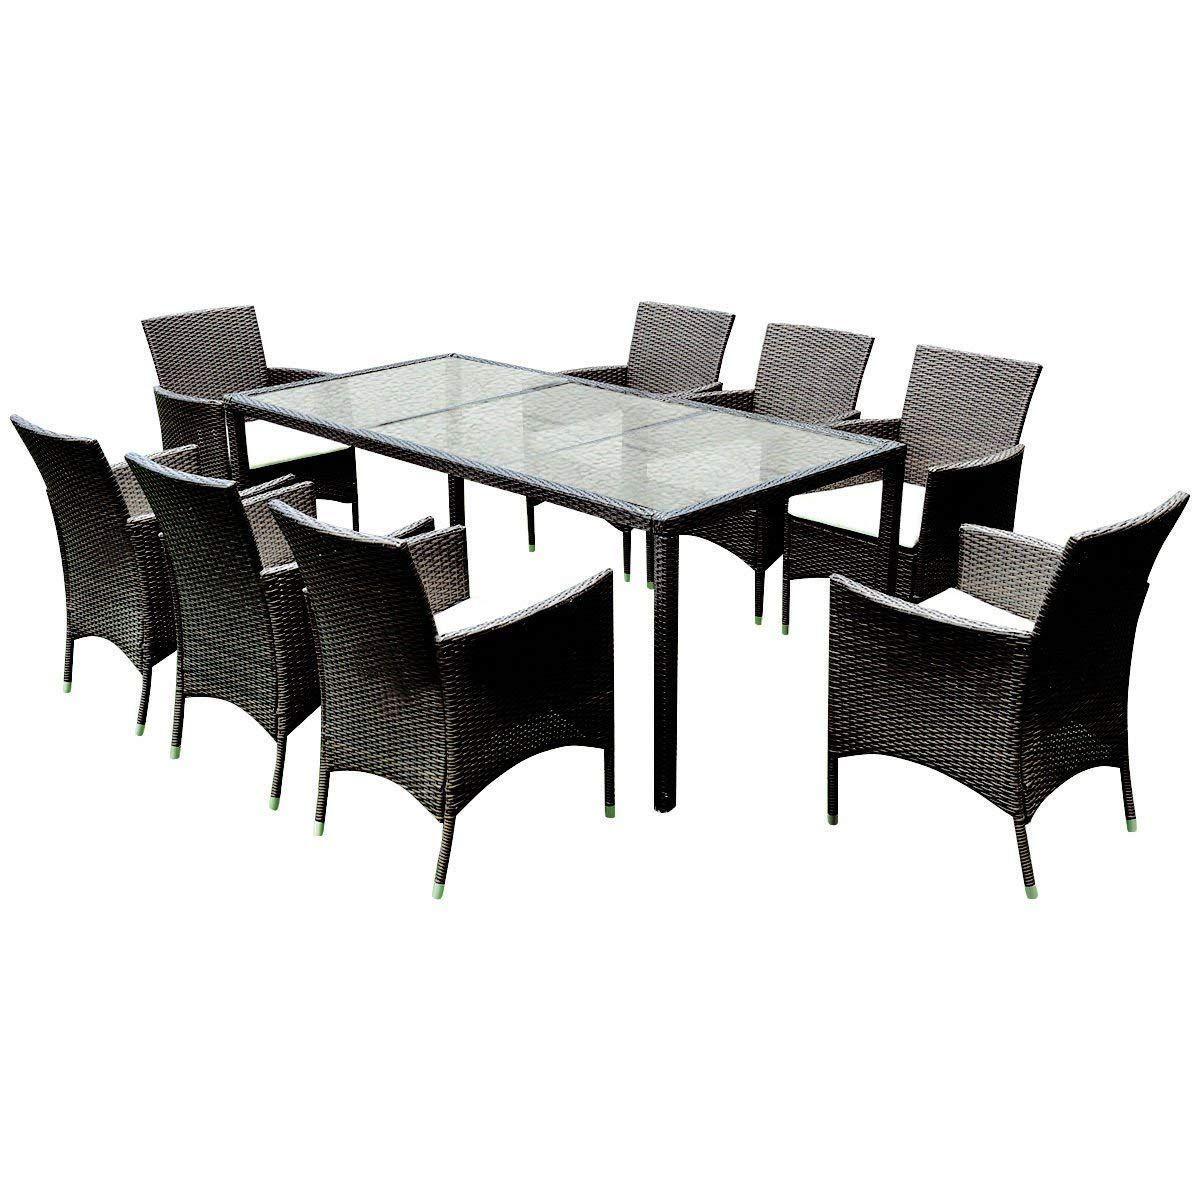 Tangkula 9pcs Patio Wicker Furniture Set Outdoor Garden Modern